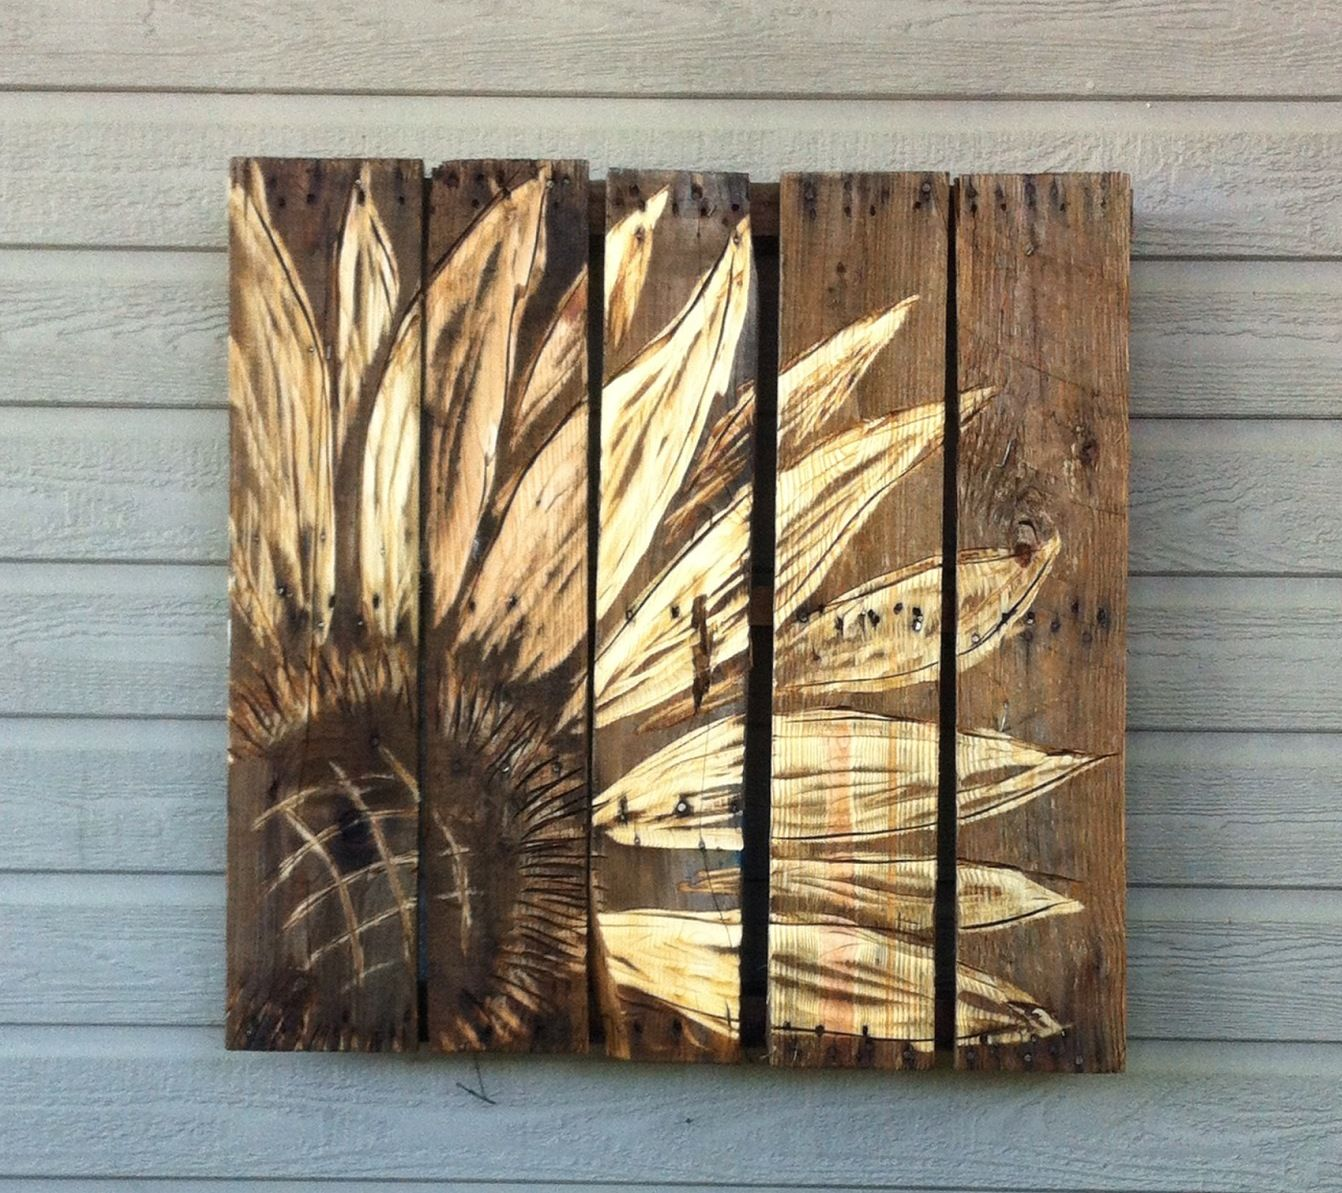 Wooden Pallet Carved With Angle Grinder. Art